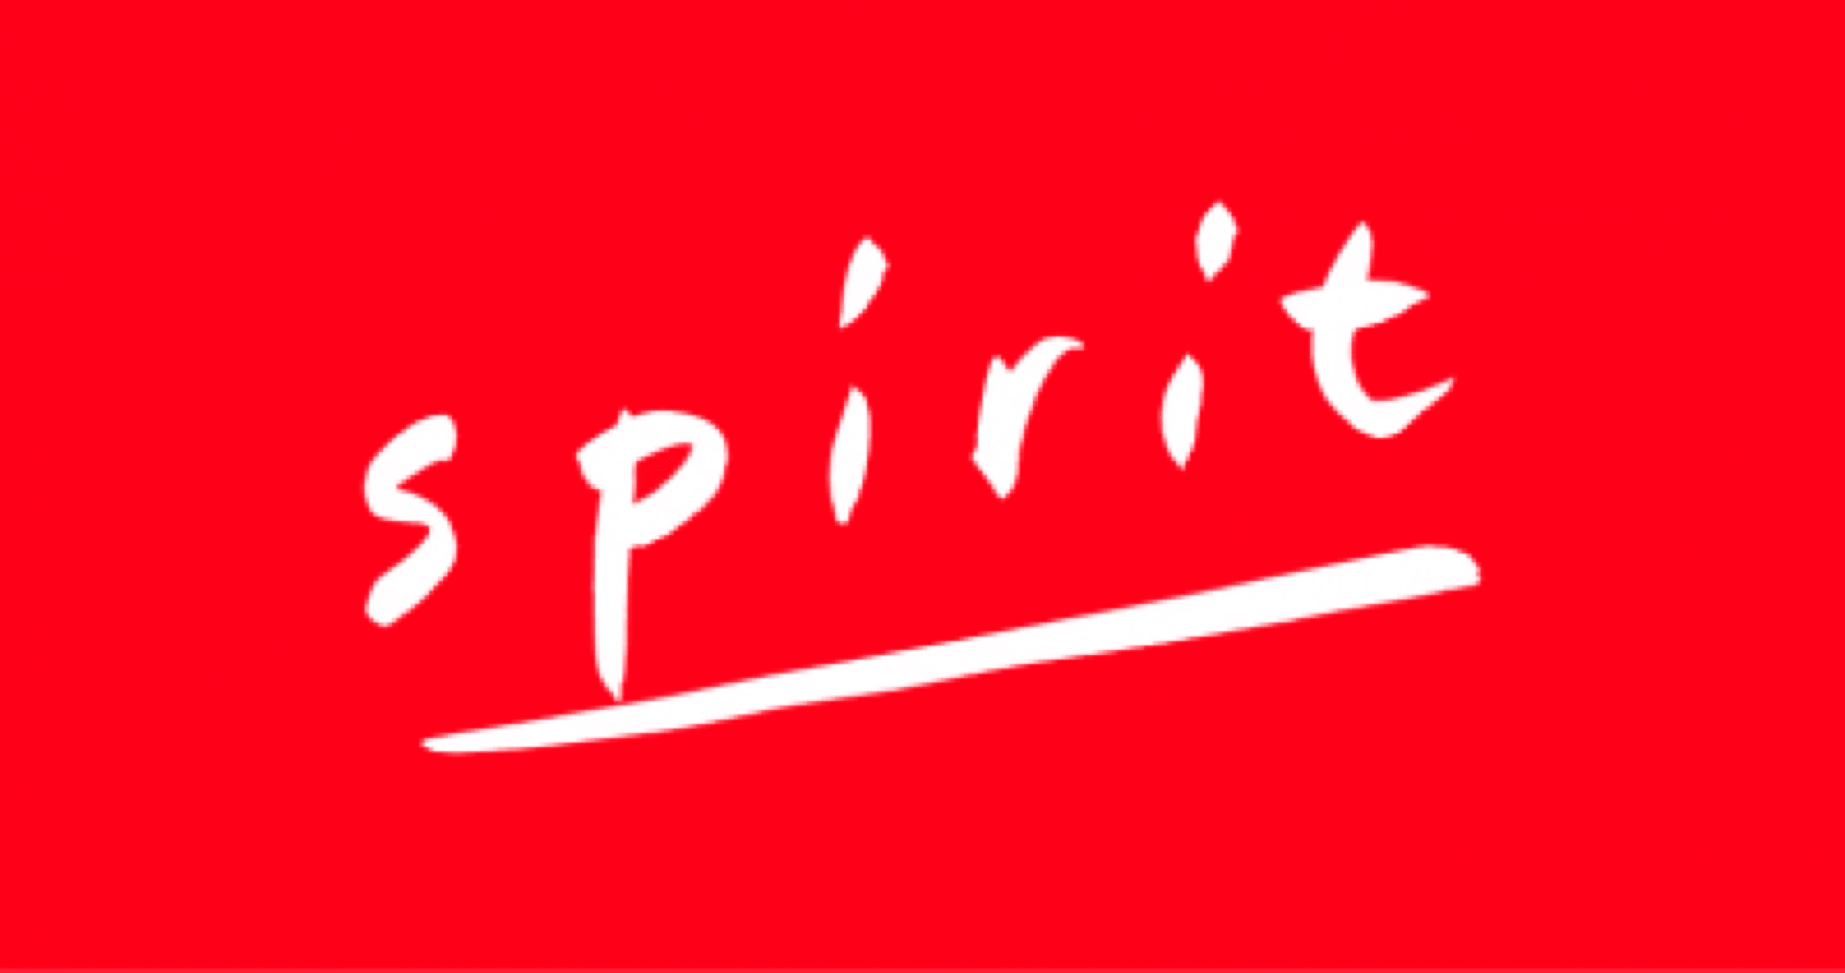 Spiritlogo